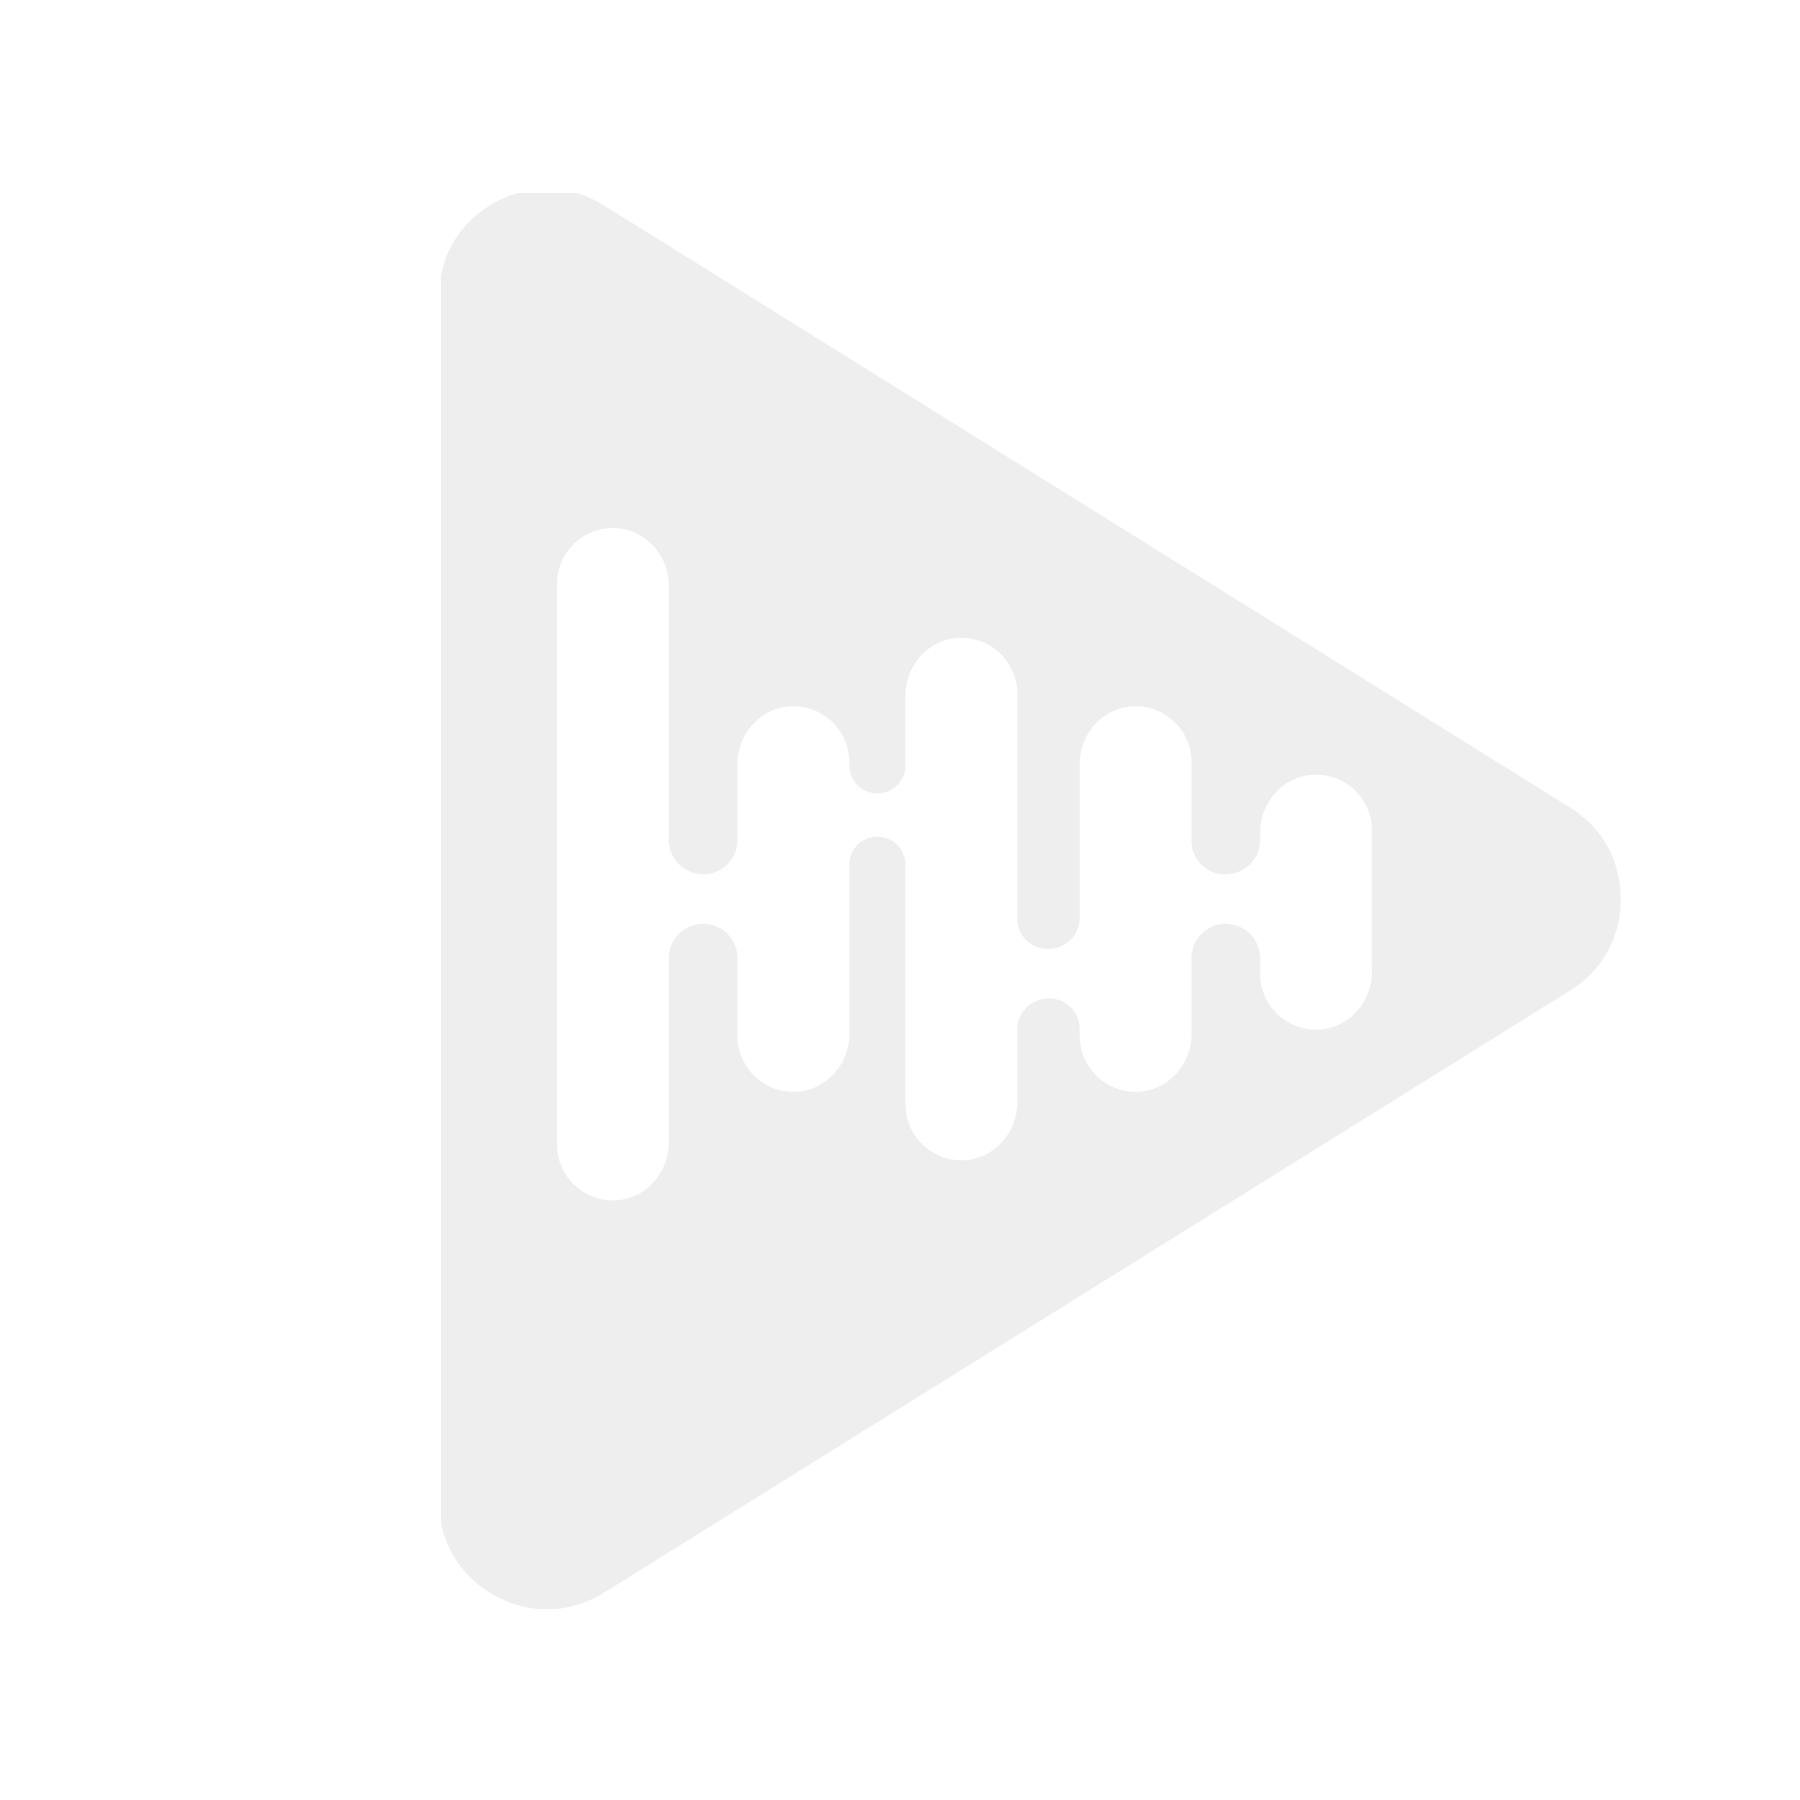 Grandview 148638 - Lerret Cyber, 16:9, 266x150, Manuelt 120